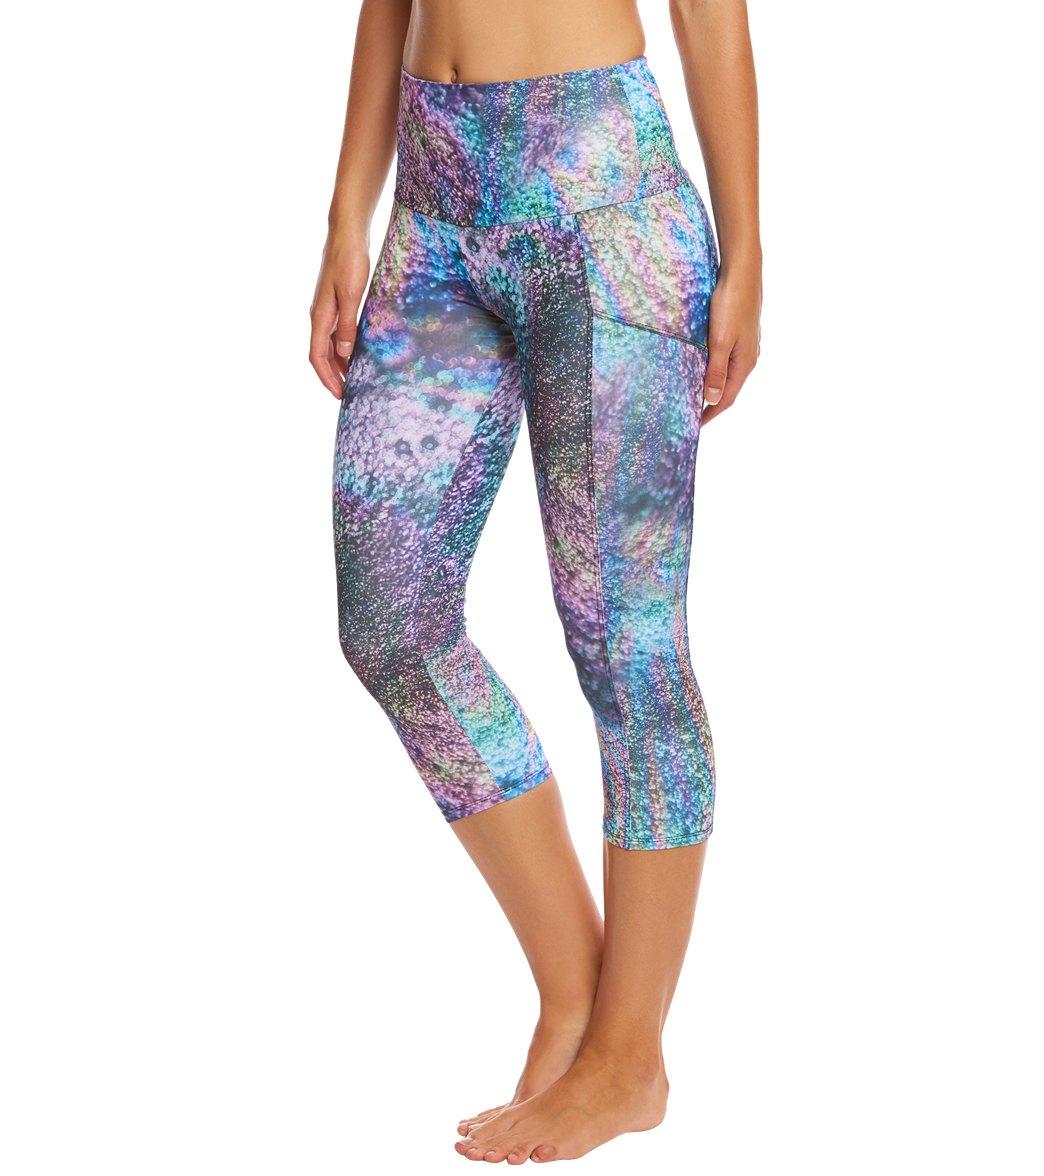 Onzie Stunner Yoga Capri Leggings at YogaOutlet.com - Free Shipping